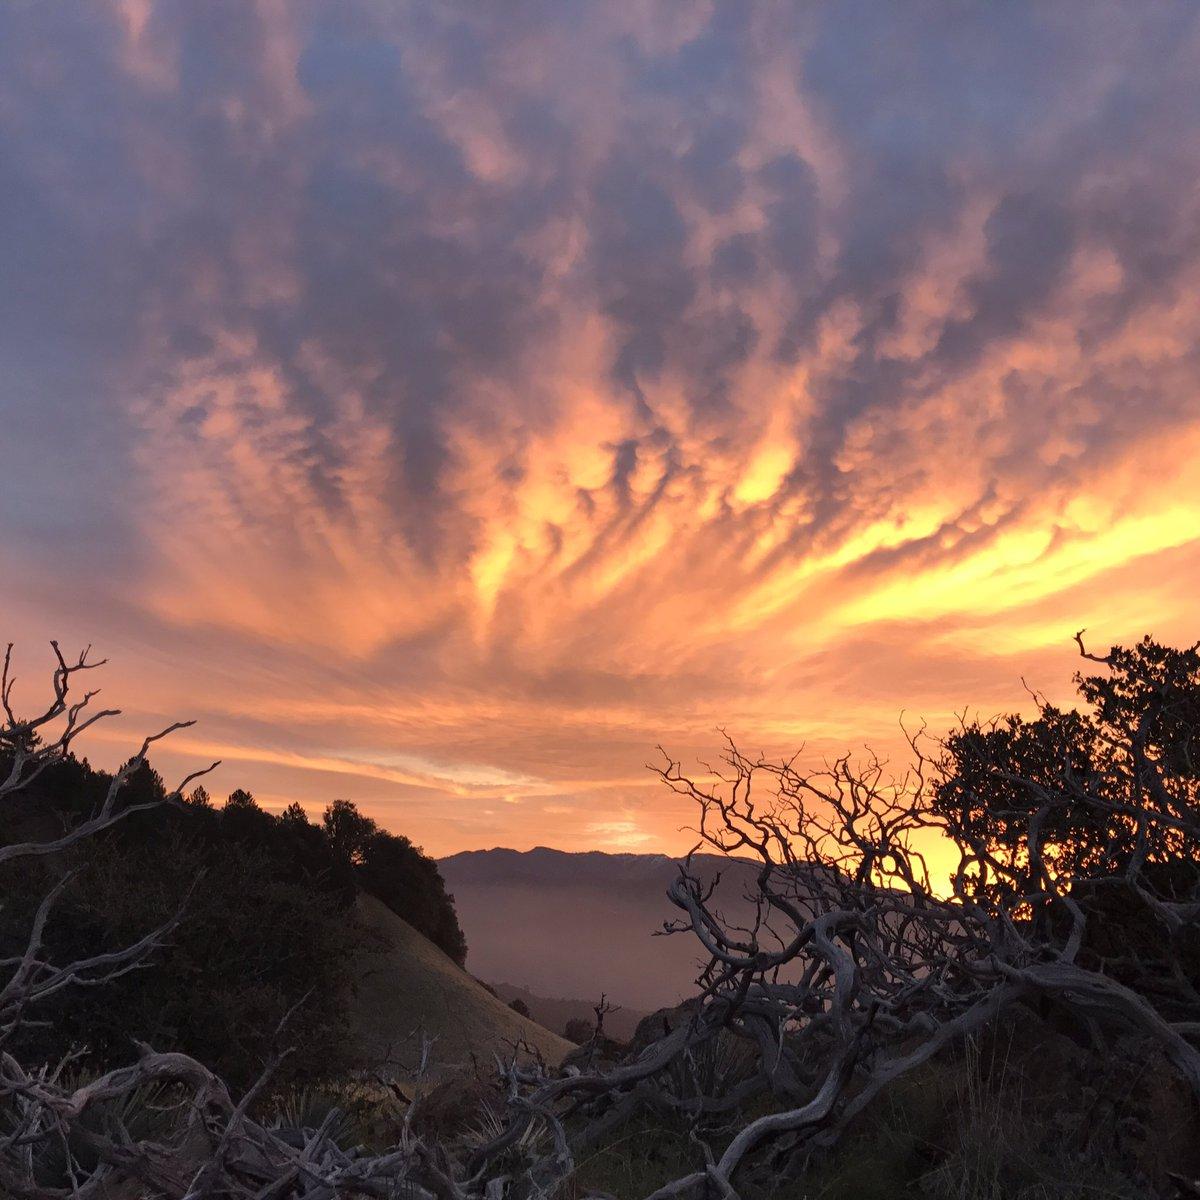 Sunday morning sunrise #hike. https://t.co/FEYuLp8Zue